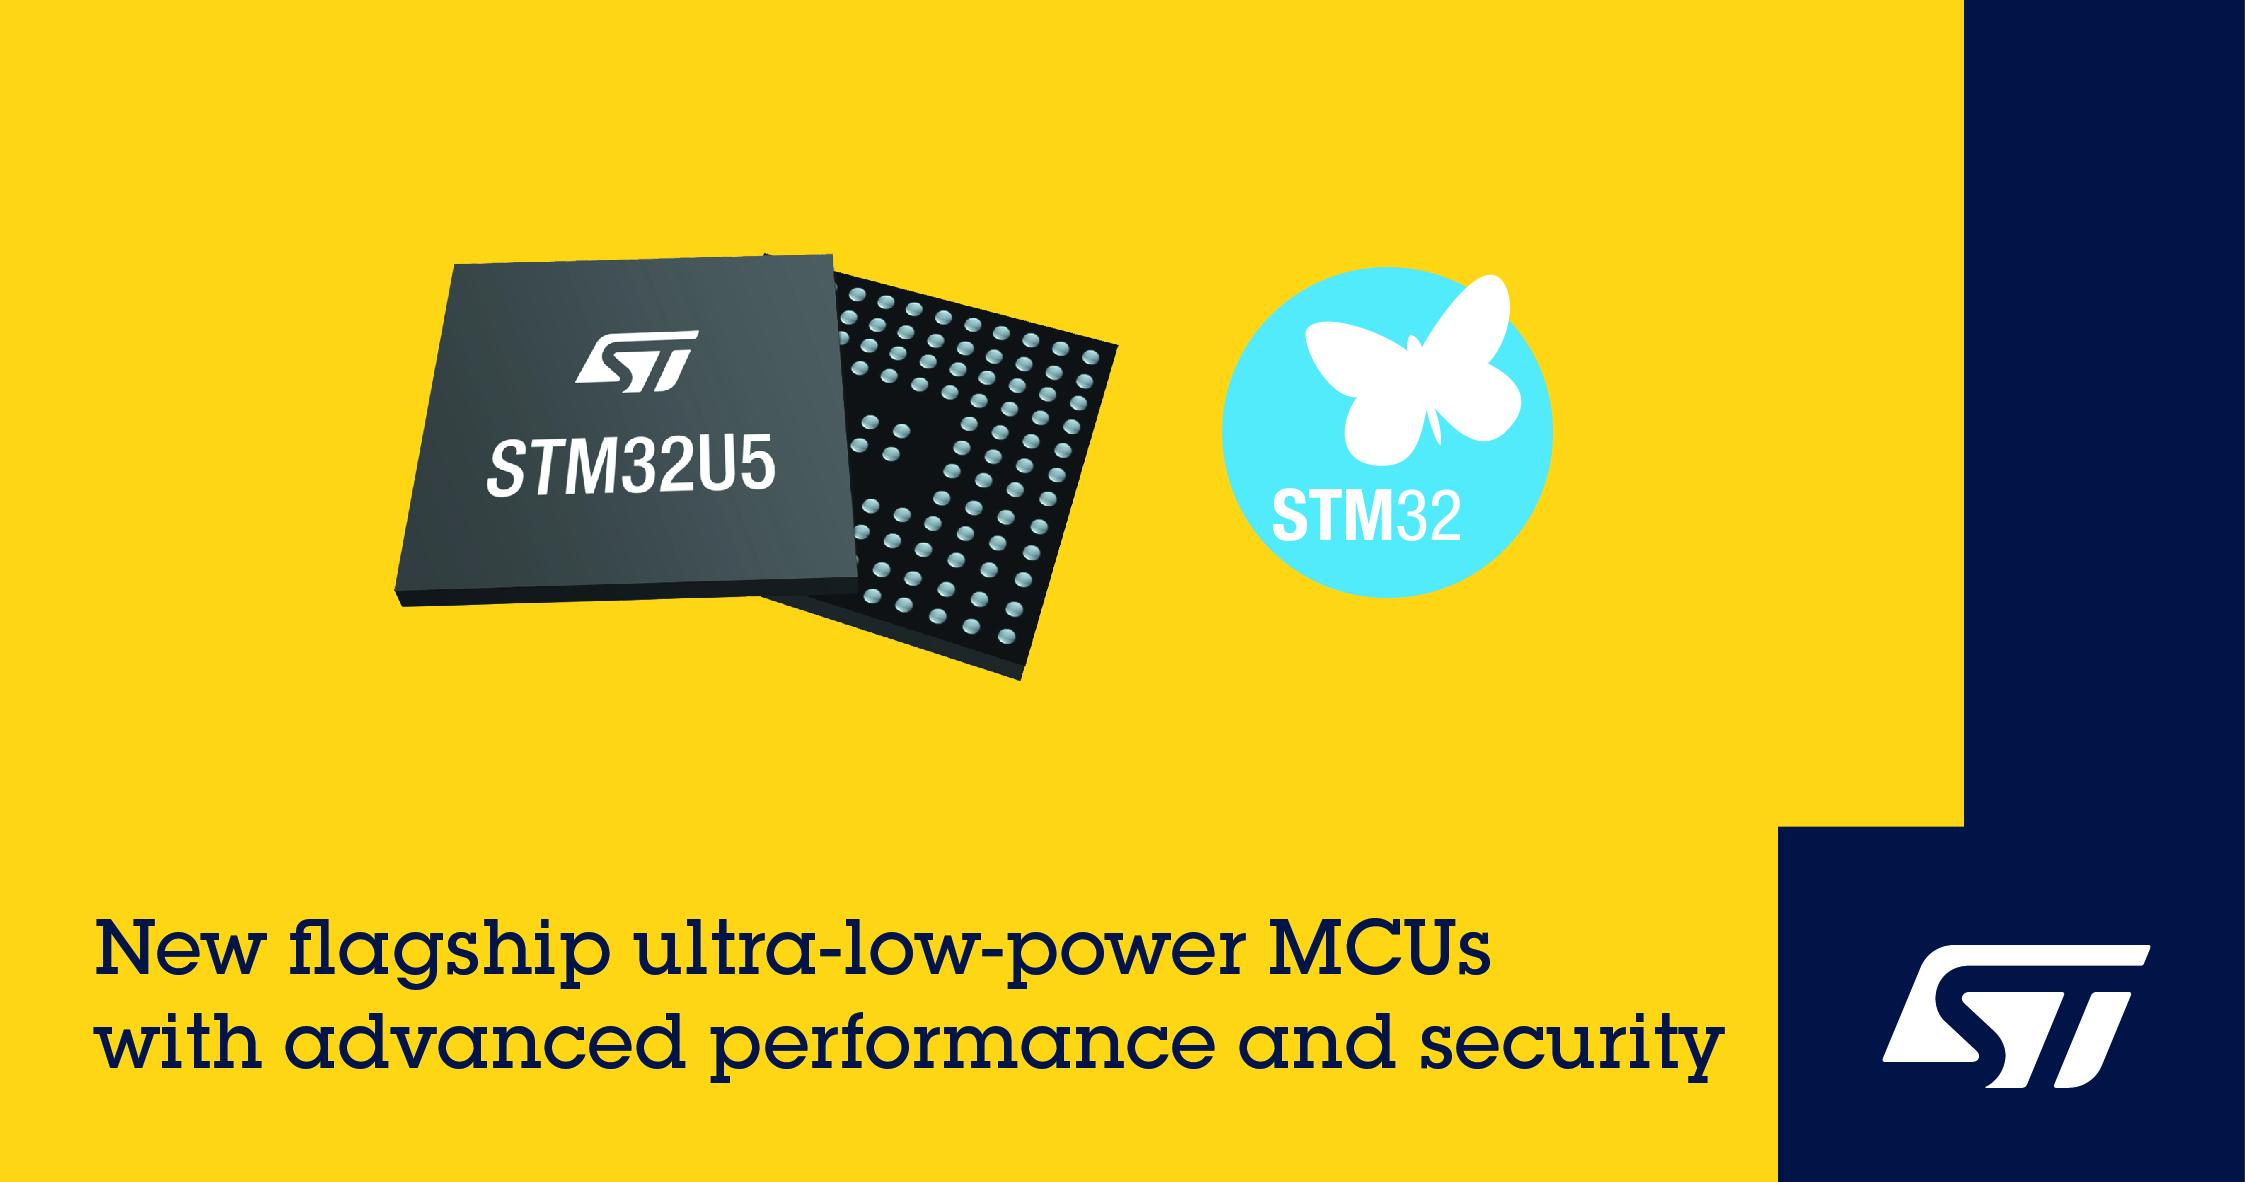 P4329S -- Feb 25 2021 -- STM32U5 MCUs_HR IMAGE